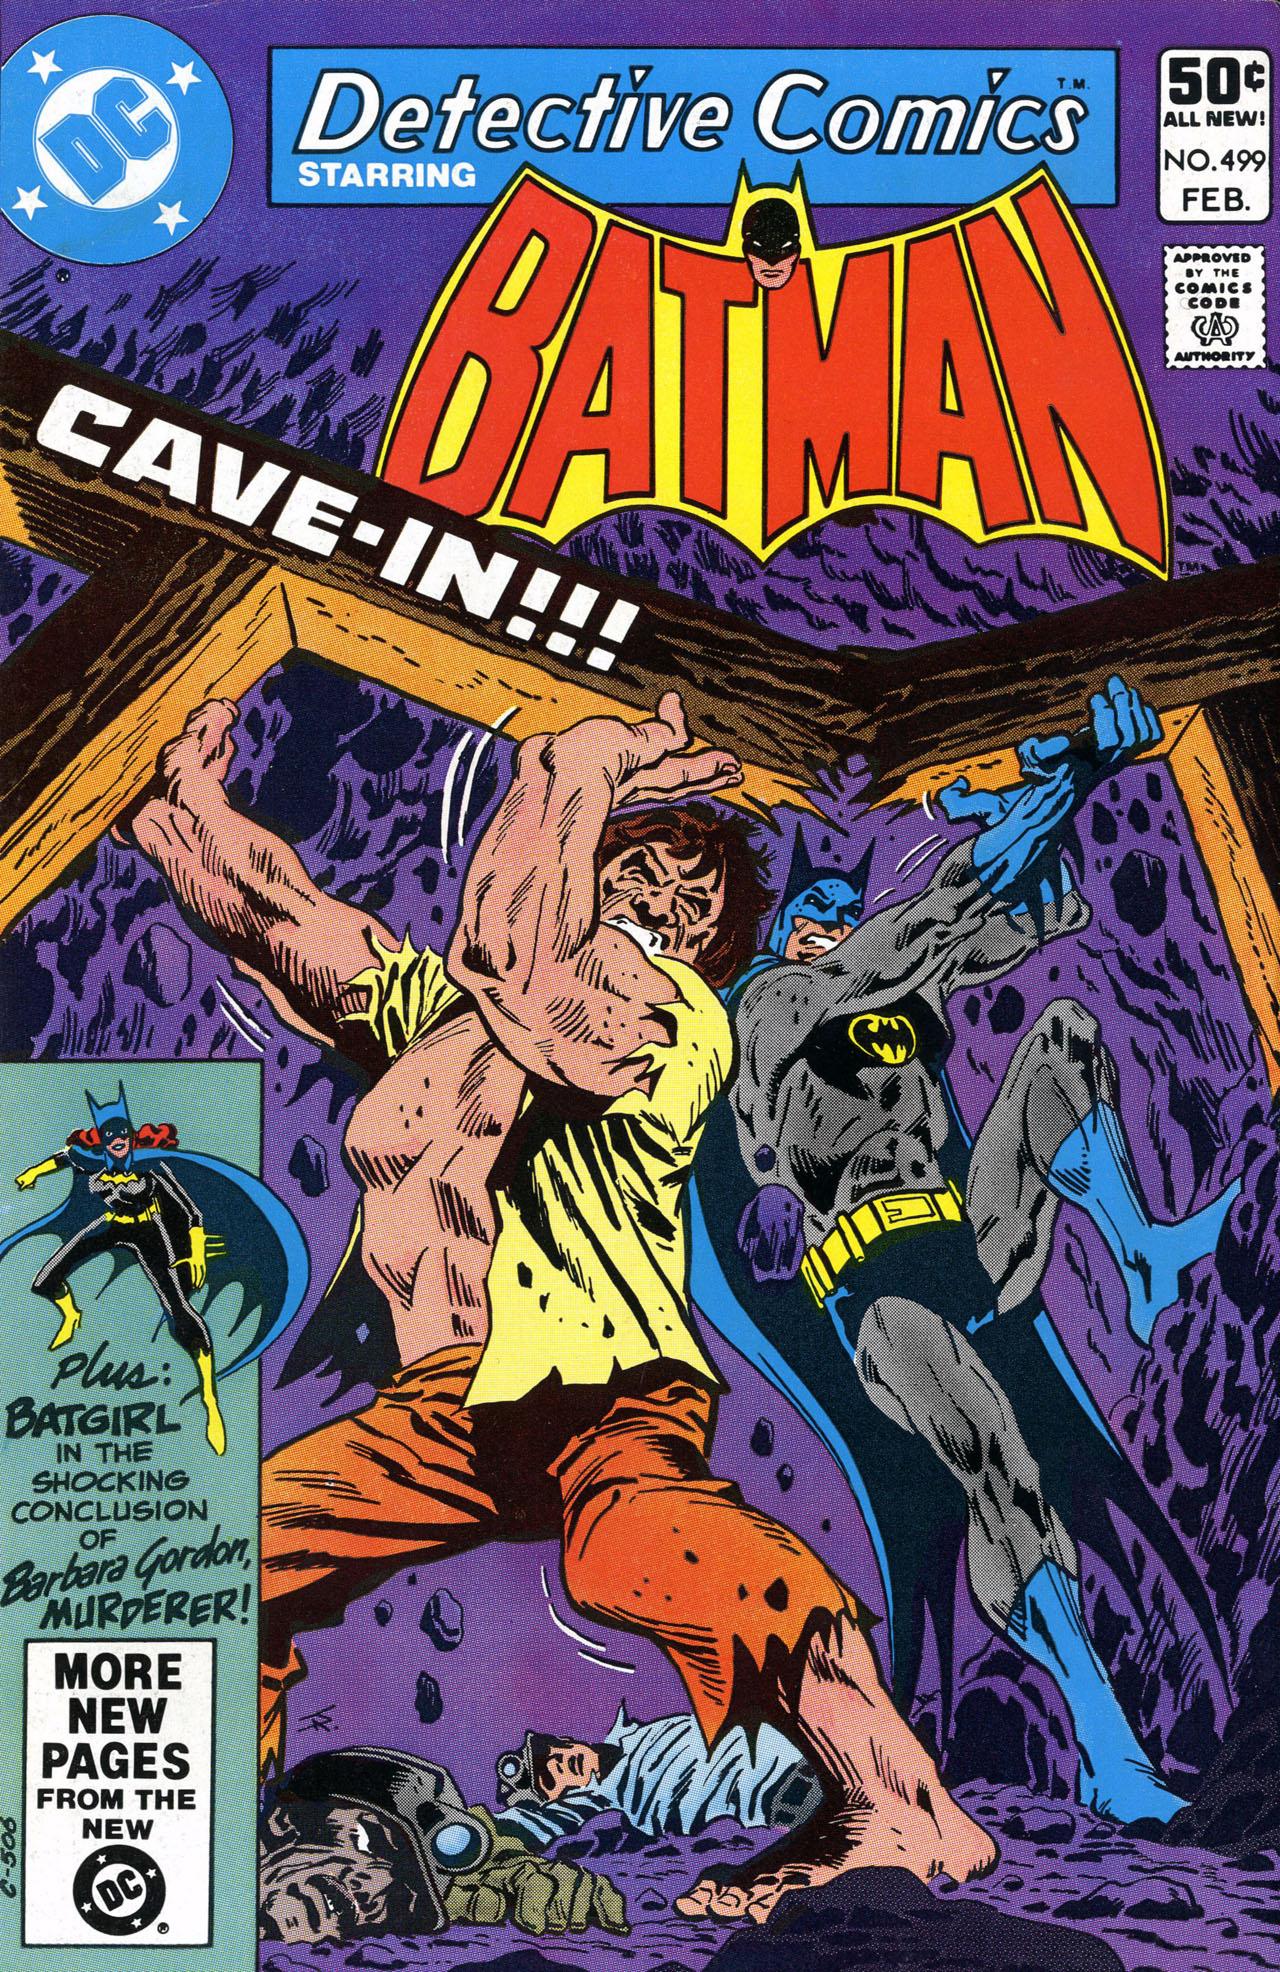 Detective Comics (1937) 499 Page 1